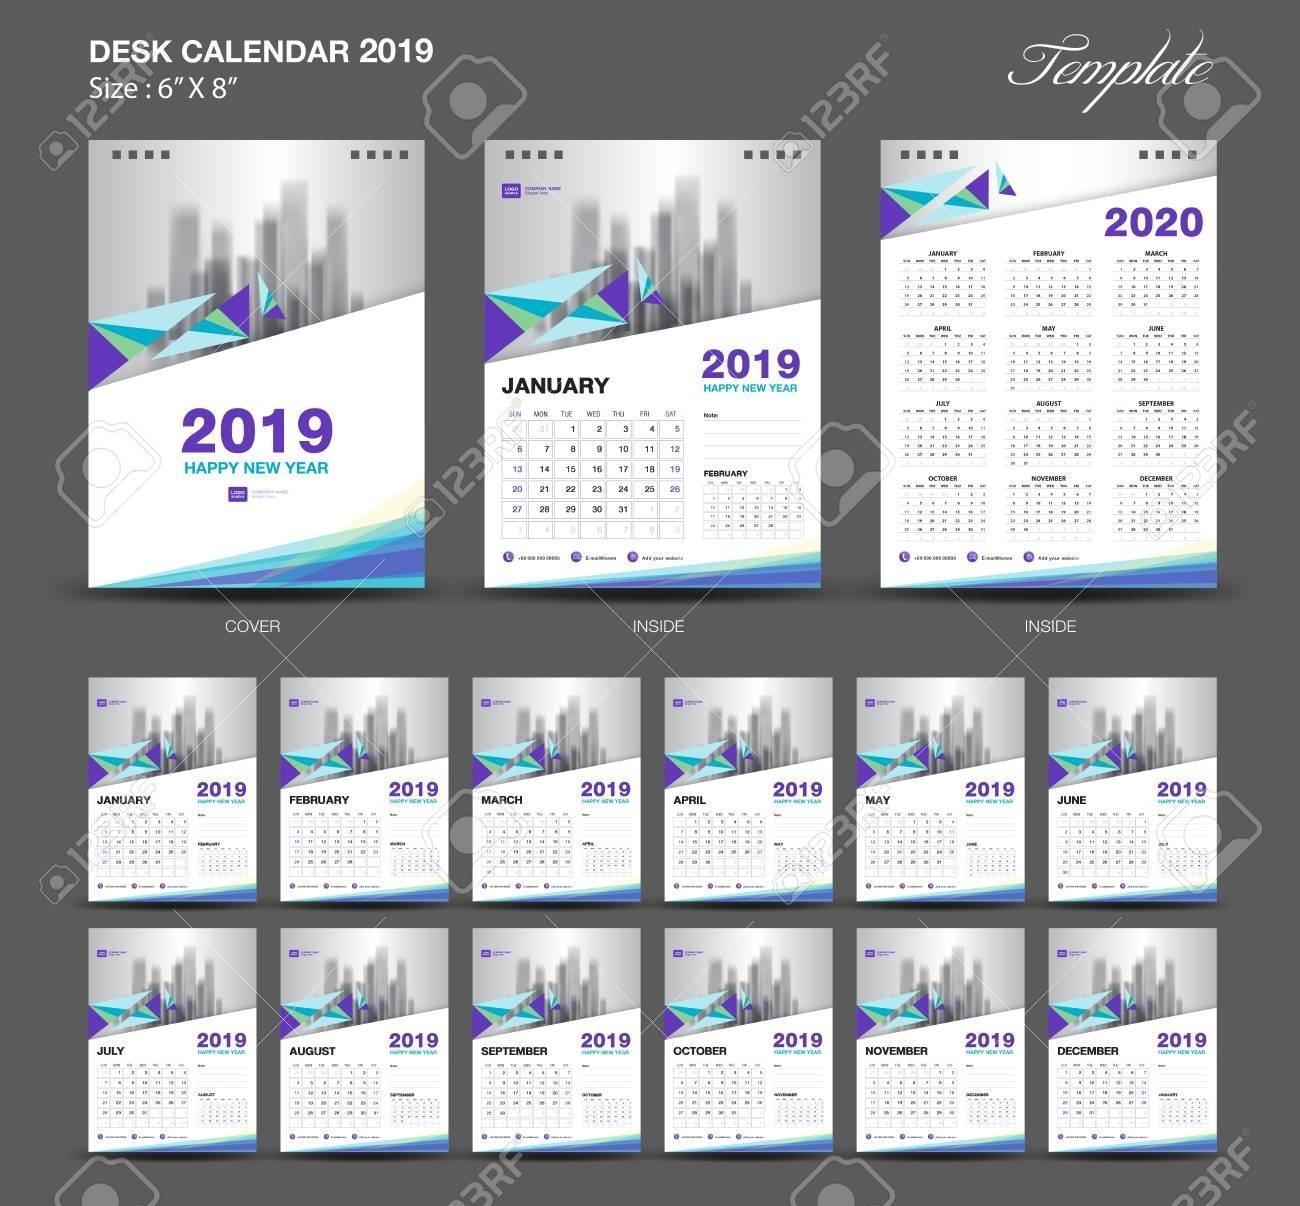 Desk Calendar 2019 Year Size 6 X 8 Inch Template, Blue Calendar X Files Calendar 2019